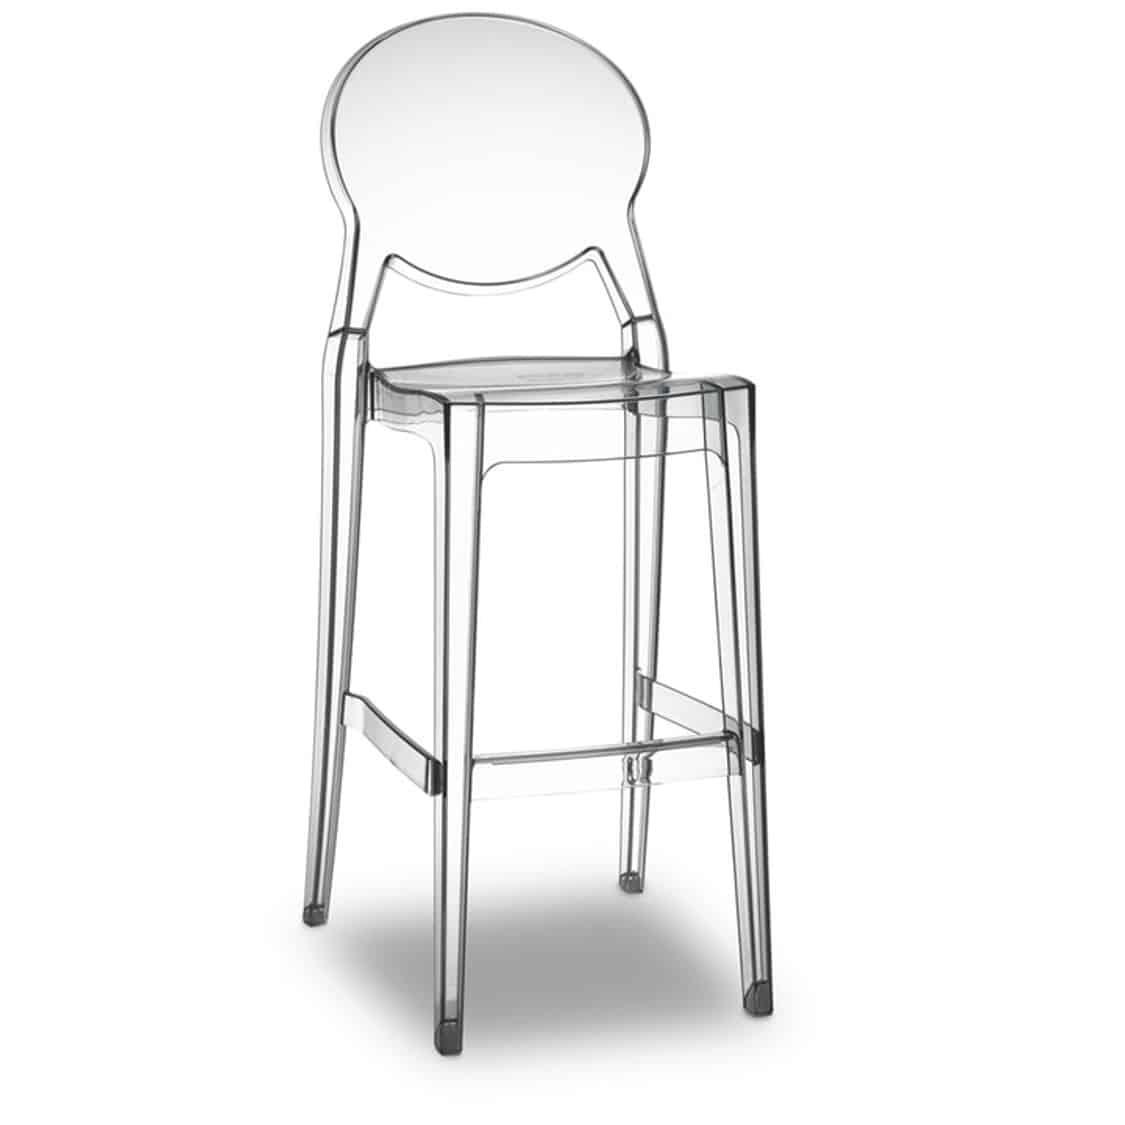 Igloo bar stool black DeFrae Contract Furniture Translucent